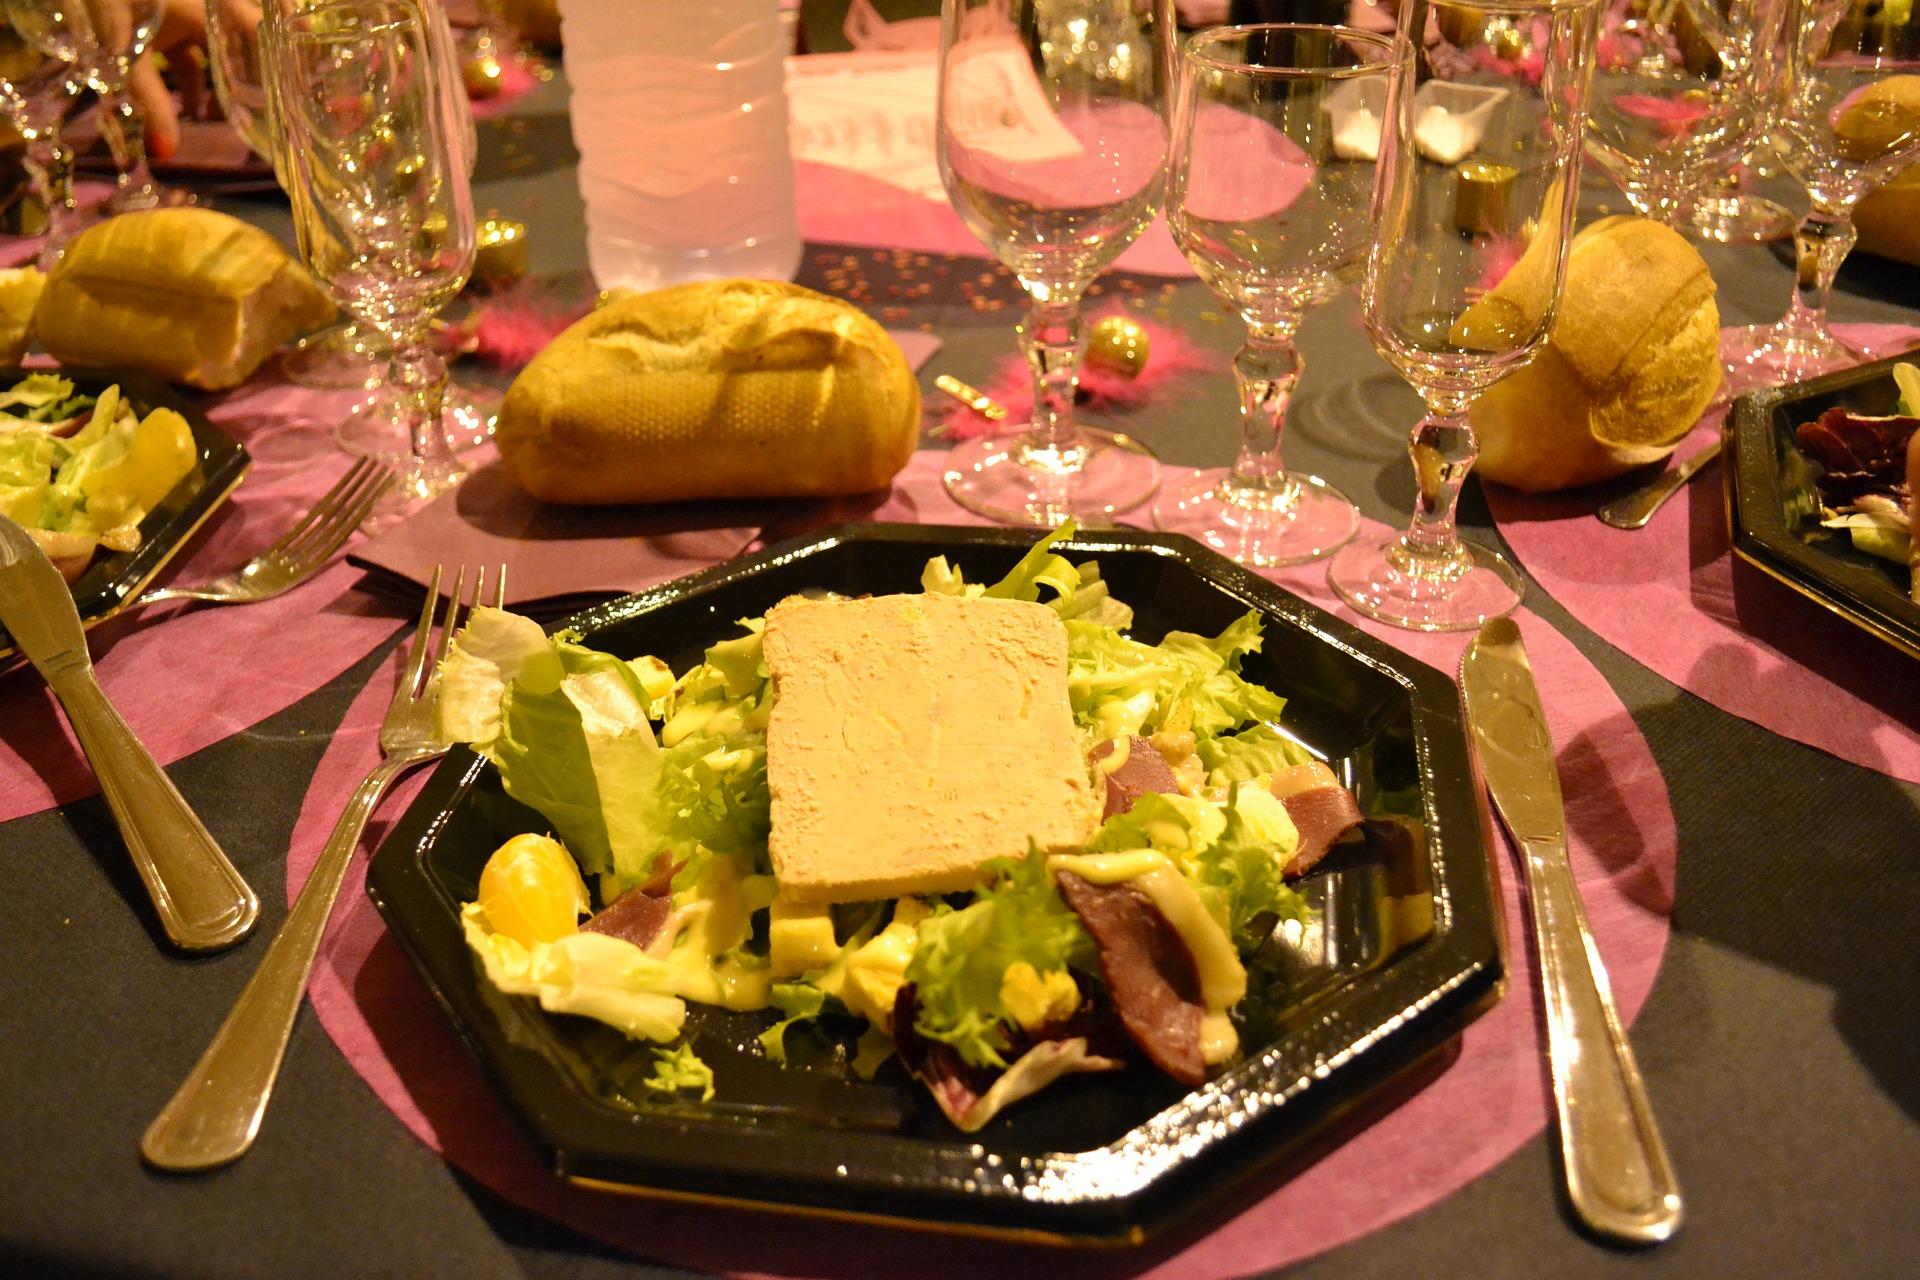 Recette de la salade périgourdine